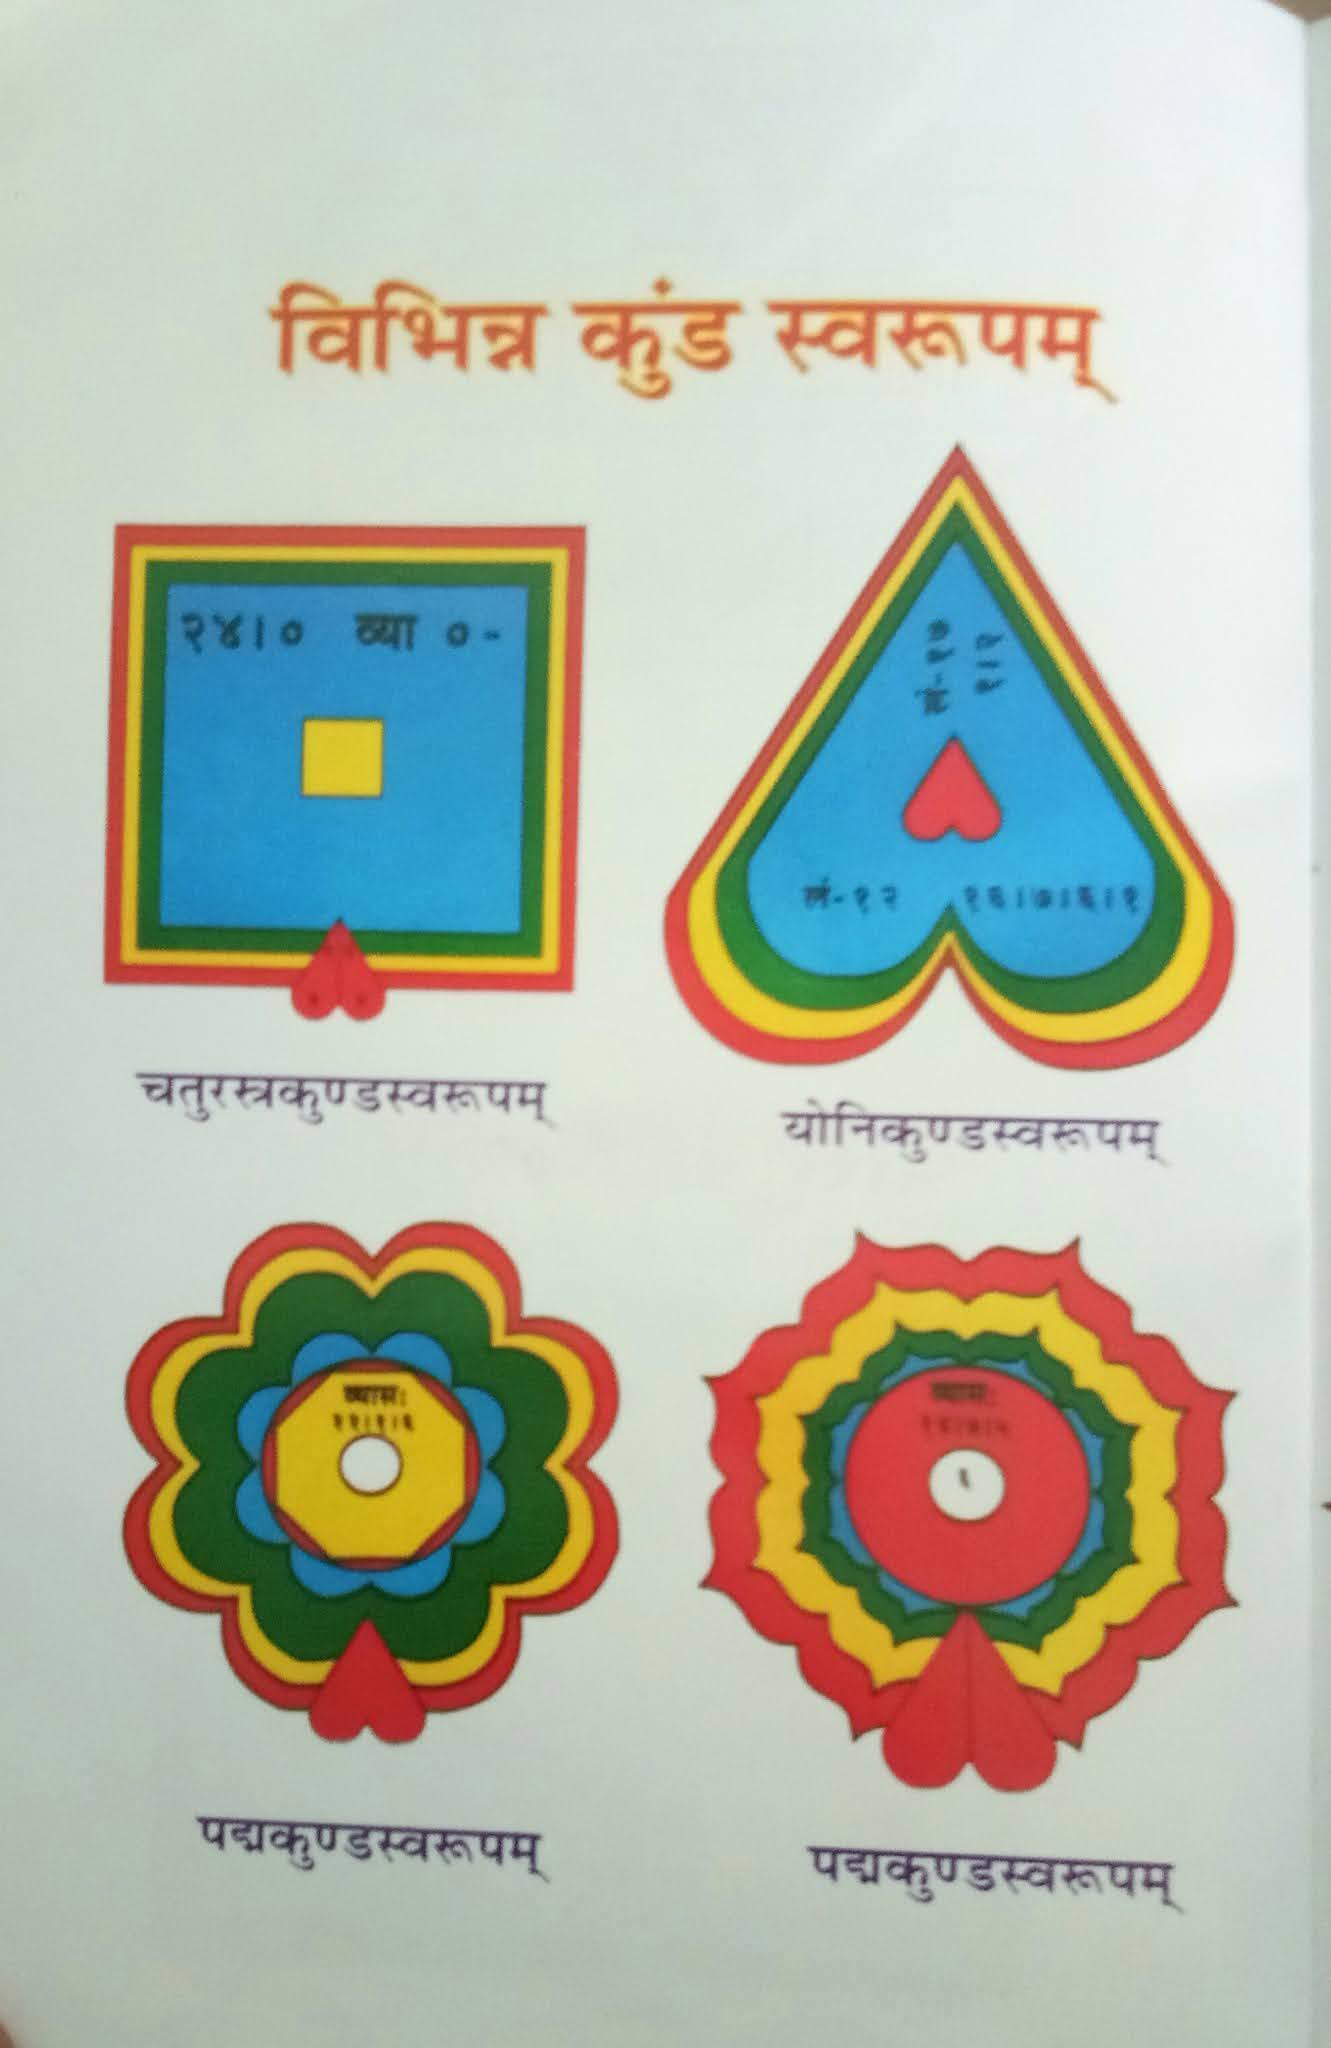 mandal chakra pdf, mandal chakra pustak, mandal chakra kitab, mandal chakra image, mandal chakra video,abha mandal chakra,adivasi mandal chakra,vastu mandal chakra,bhajan mandal chakra,chhatrapal mandal chakra,mandal chakra pdf download,sudarshan chakra mandal generator,gauri mandal chakra,ganesh mandal chakra,vastu mandal chakra image,sarvatobhadra mandal chakra image,kshetrapal mandal chakra,mahila mandal chakra,chakra mandal nipania,navgrah mandal chakra,navagraha mandal chakra,vastu mandal chakra photo,sarvatobhadra mandal chakra,chakra sudarshan mandal,chakra mandal vidhan,siddha chakra mandal vidhan